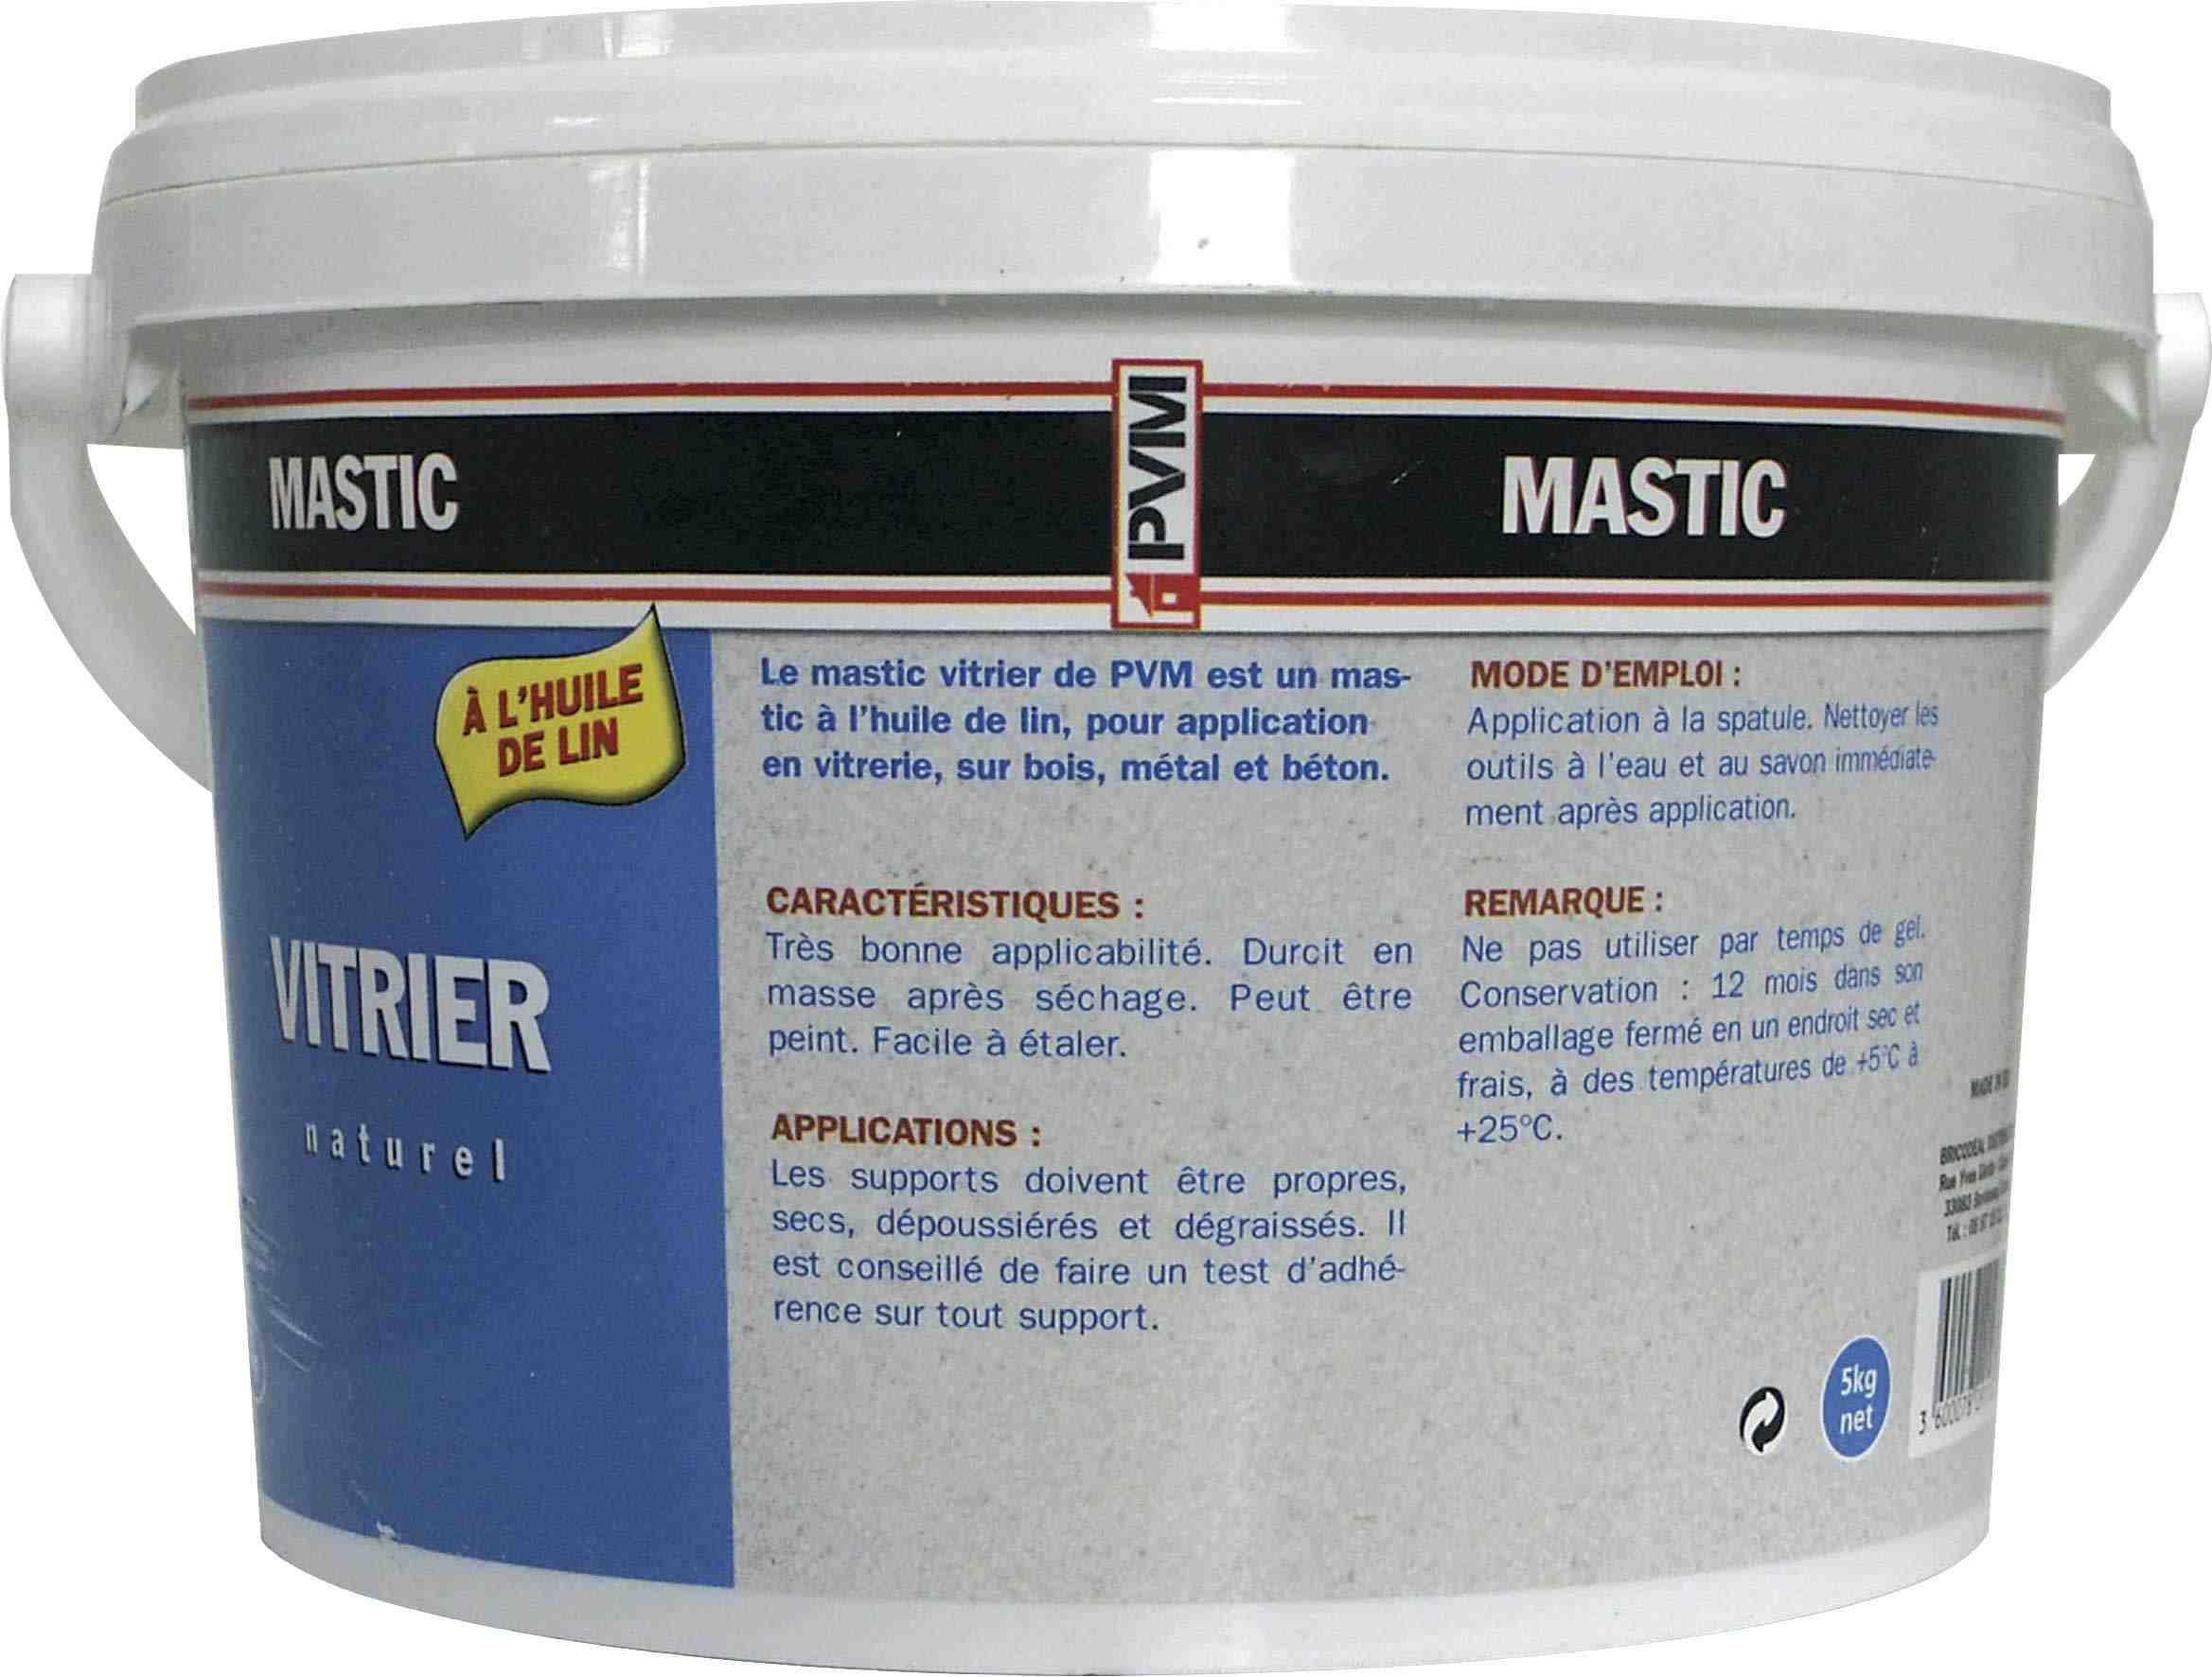 mastic vitrier pvm naturel pot 5 kg de mastic vitrier. Black Bedroom Furniture Sets. Home Design Ideas